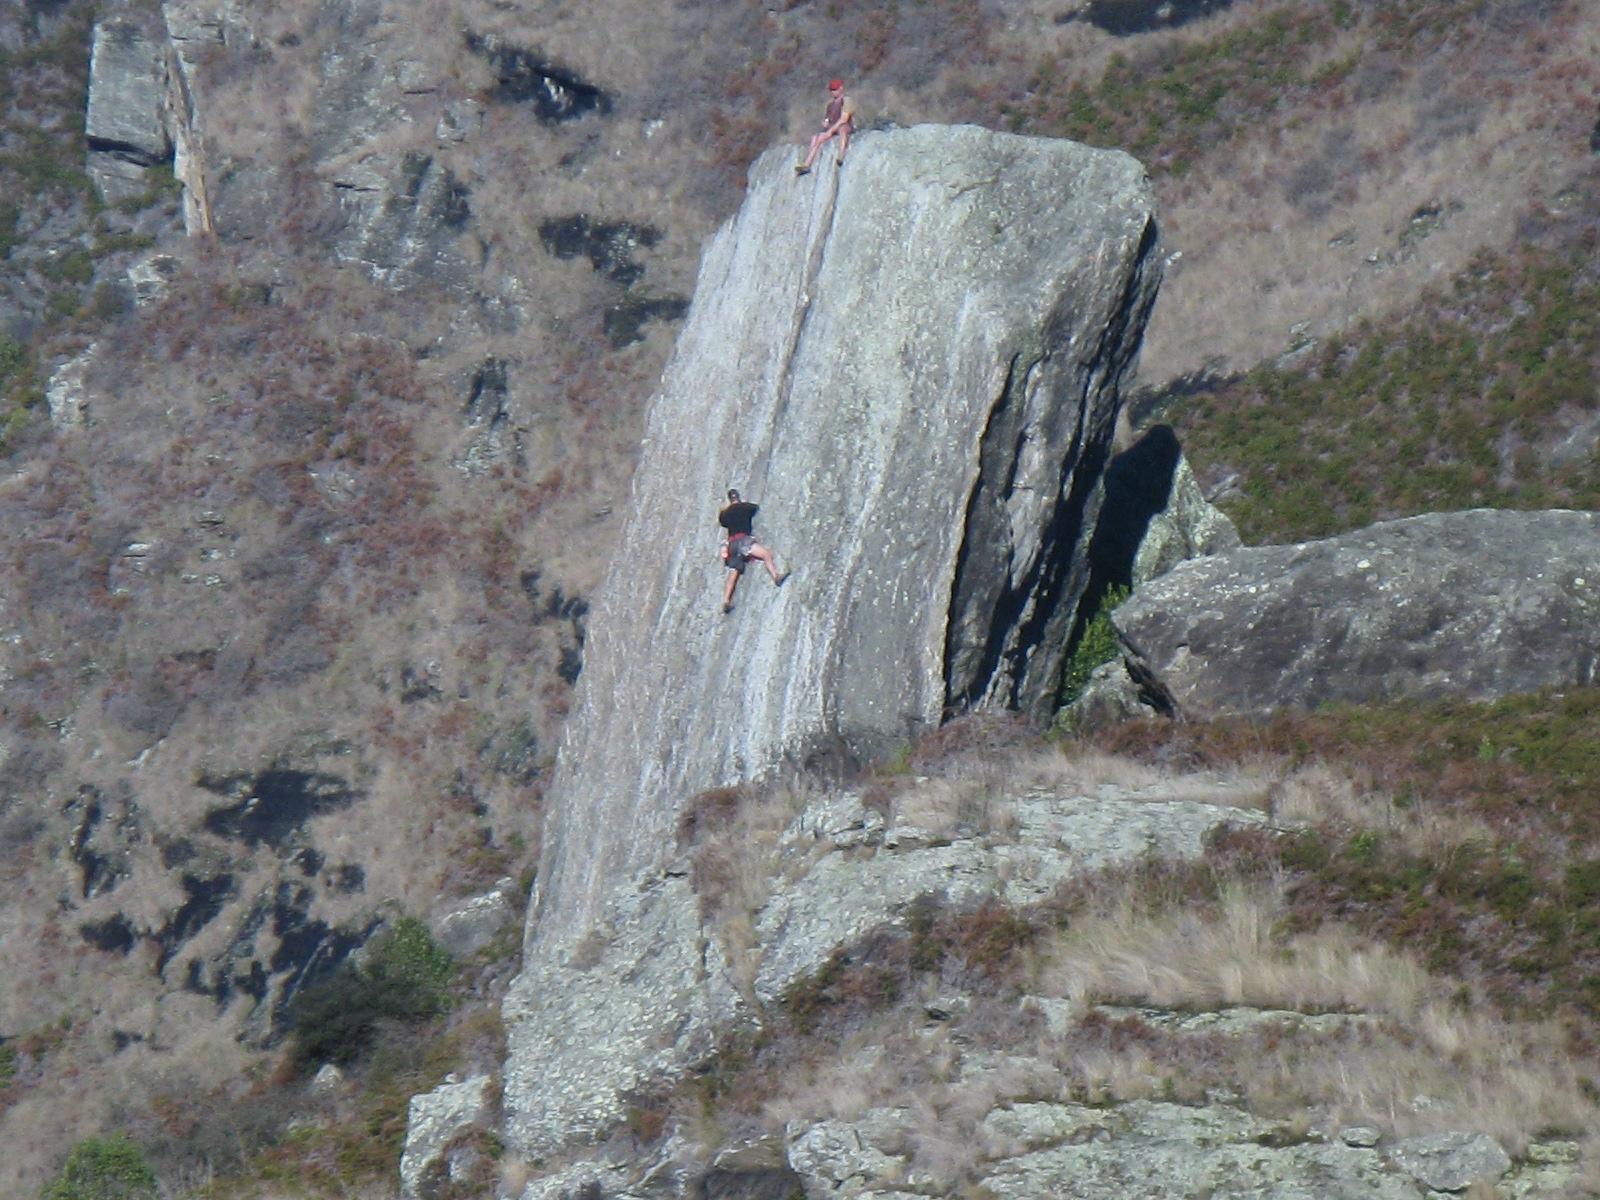 Rock Climbing in New Zealand